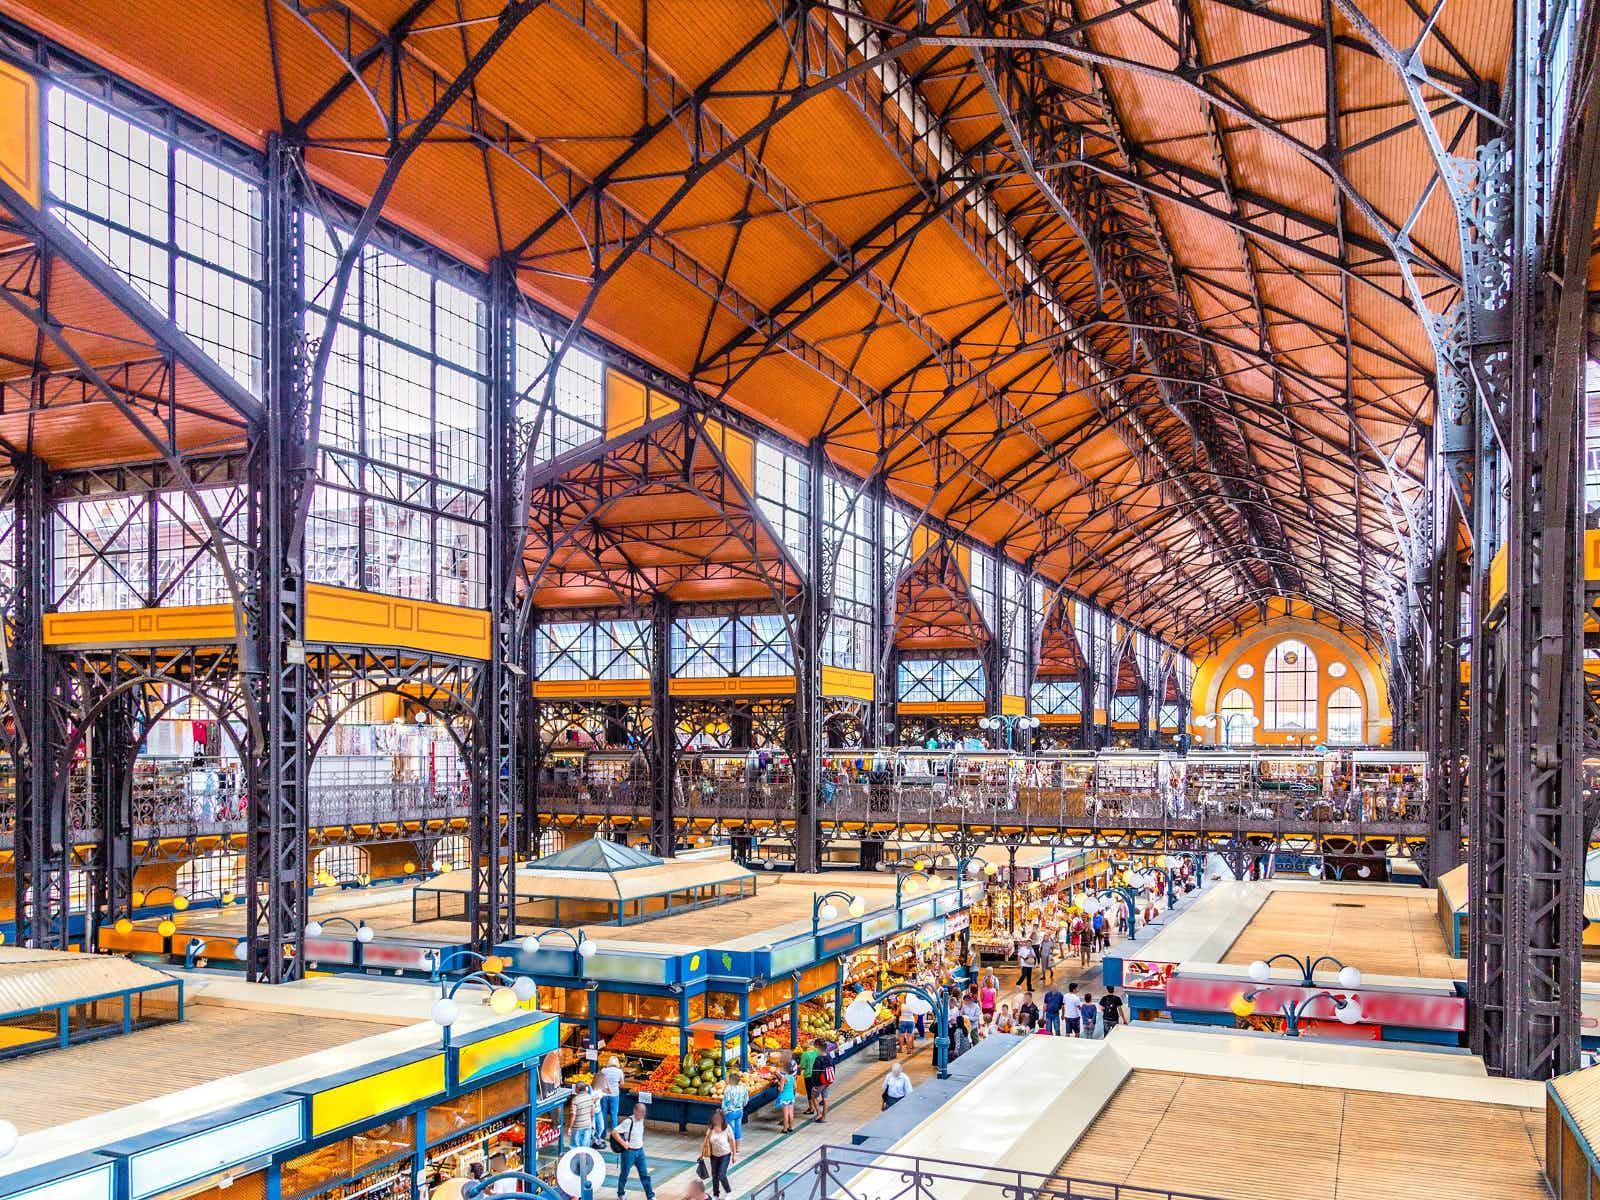 Central Market Hall in Budapest © GoneWithTheWind / Shutterstock